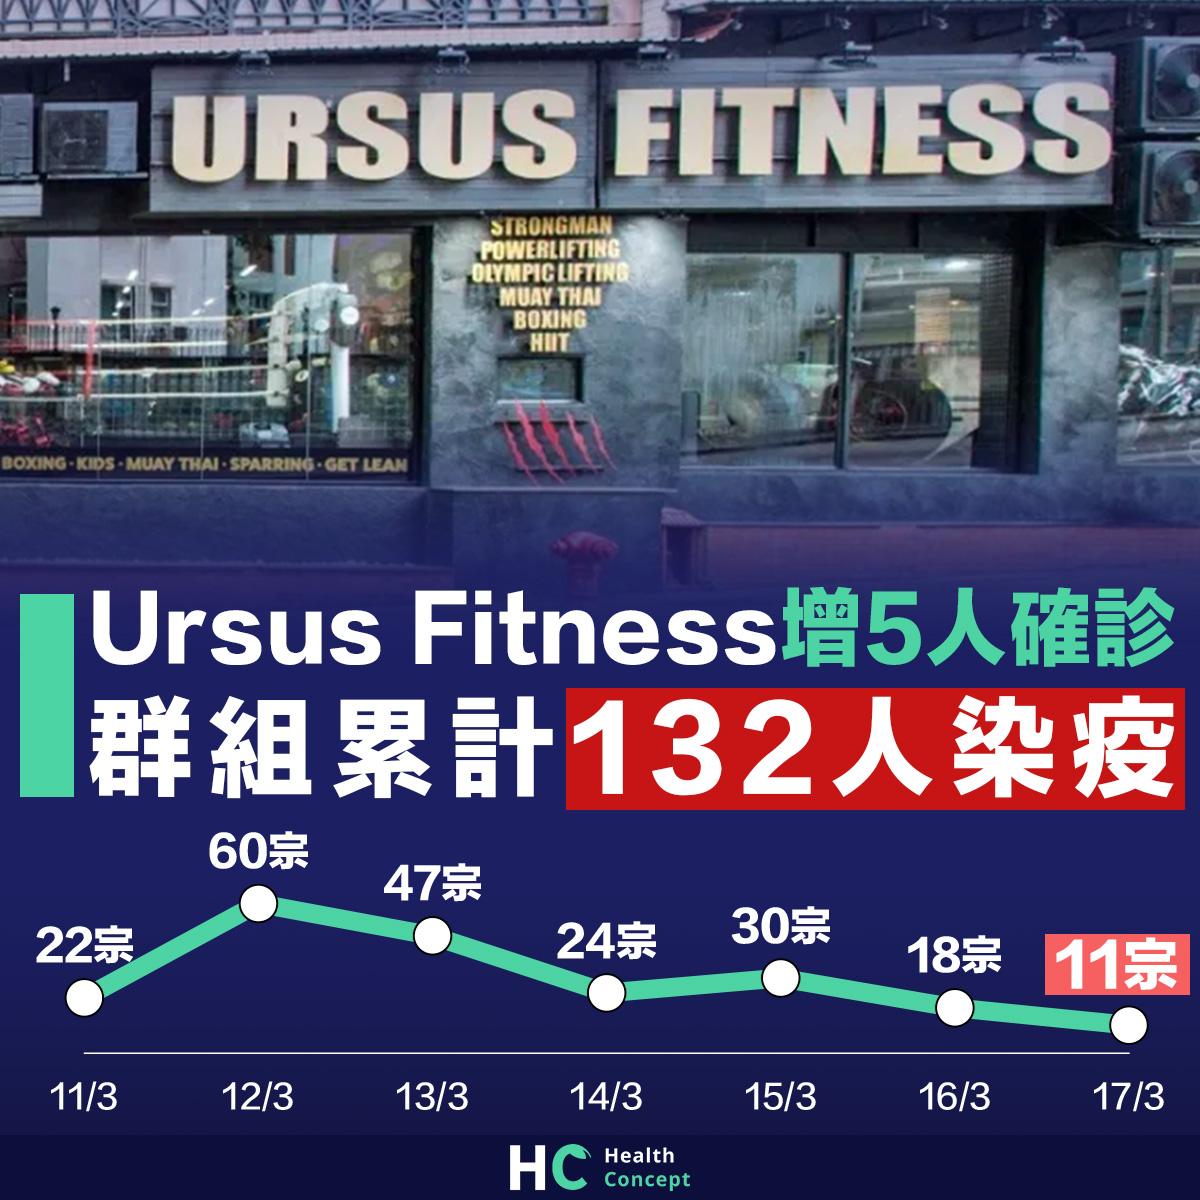 Ursus Fitness增5人確診 群組累計132人染疫